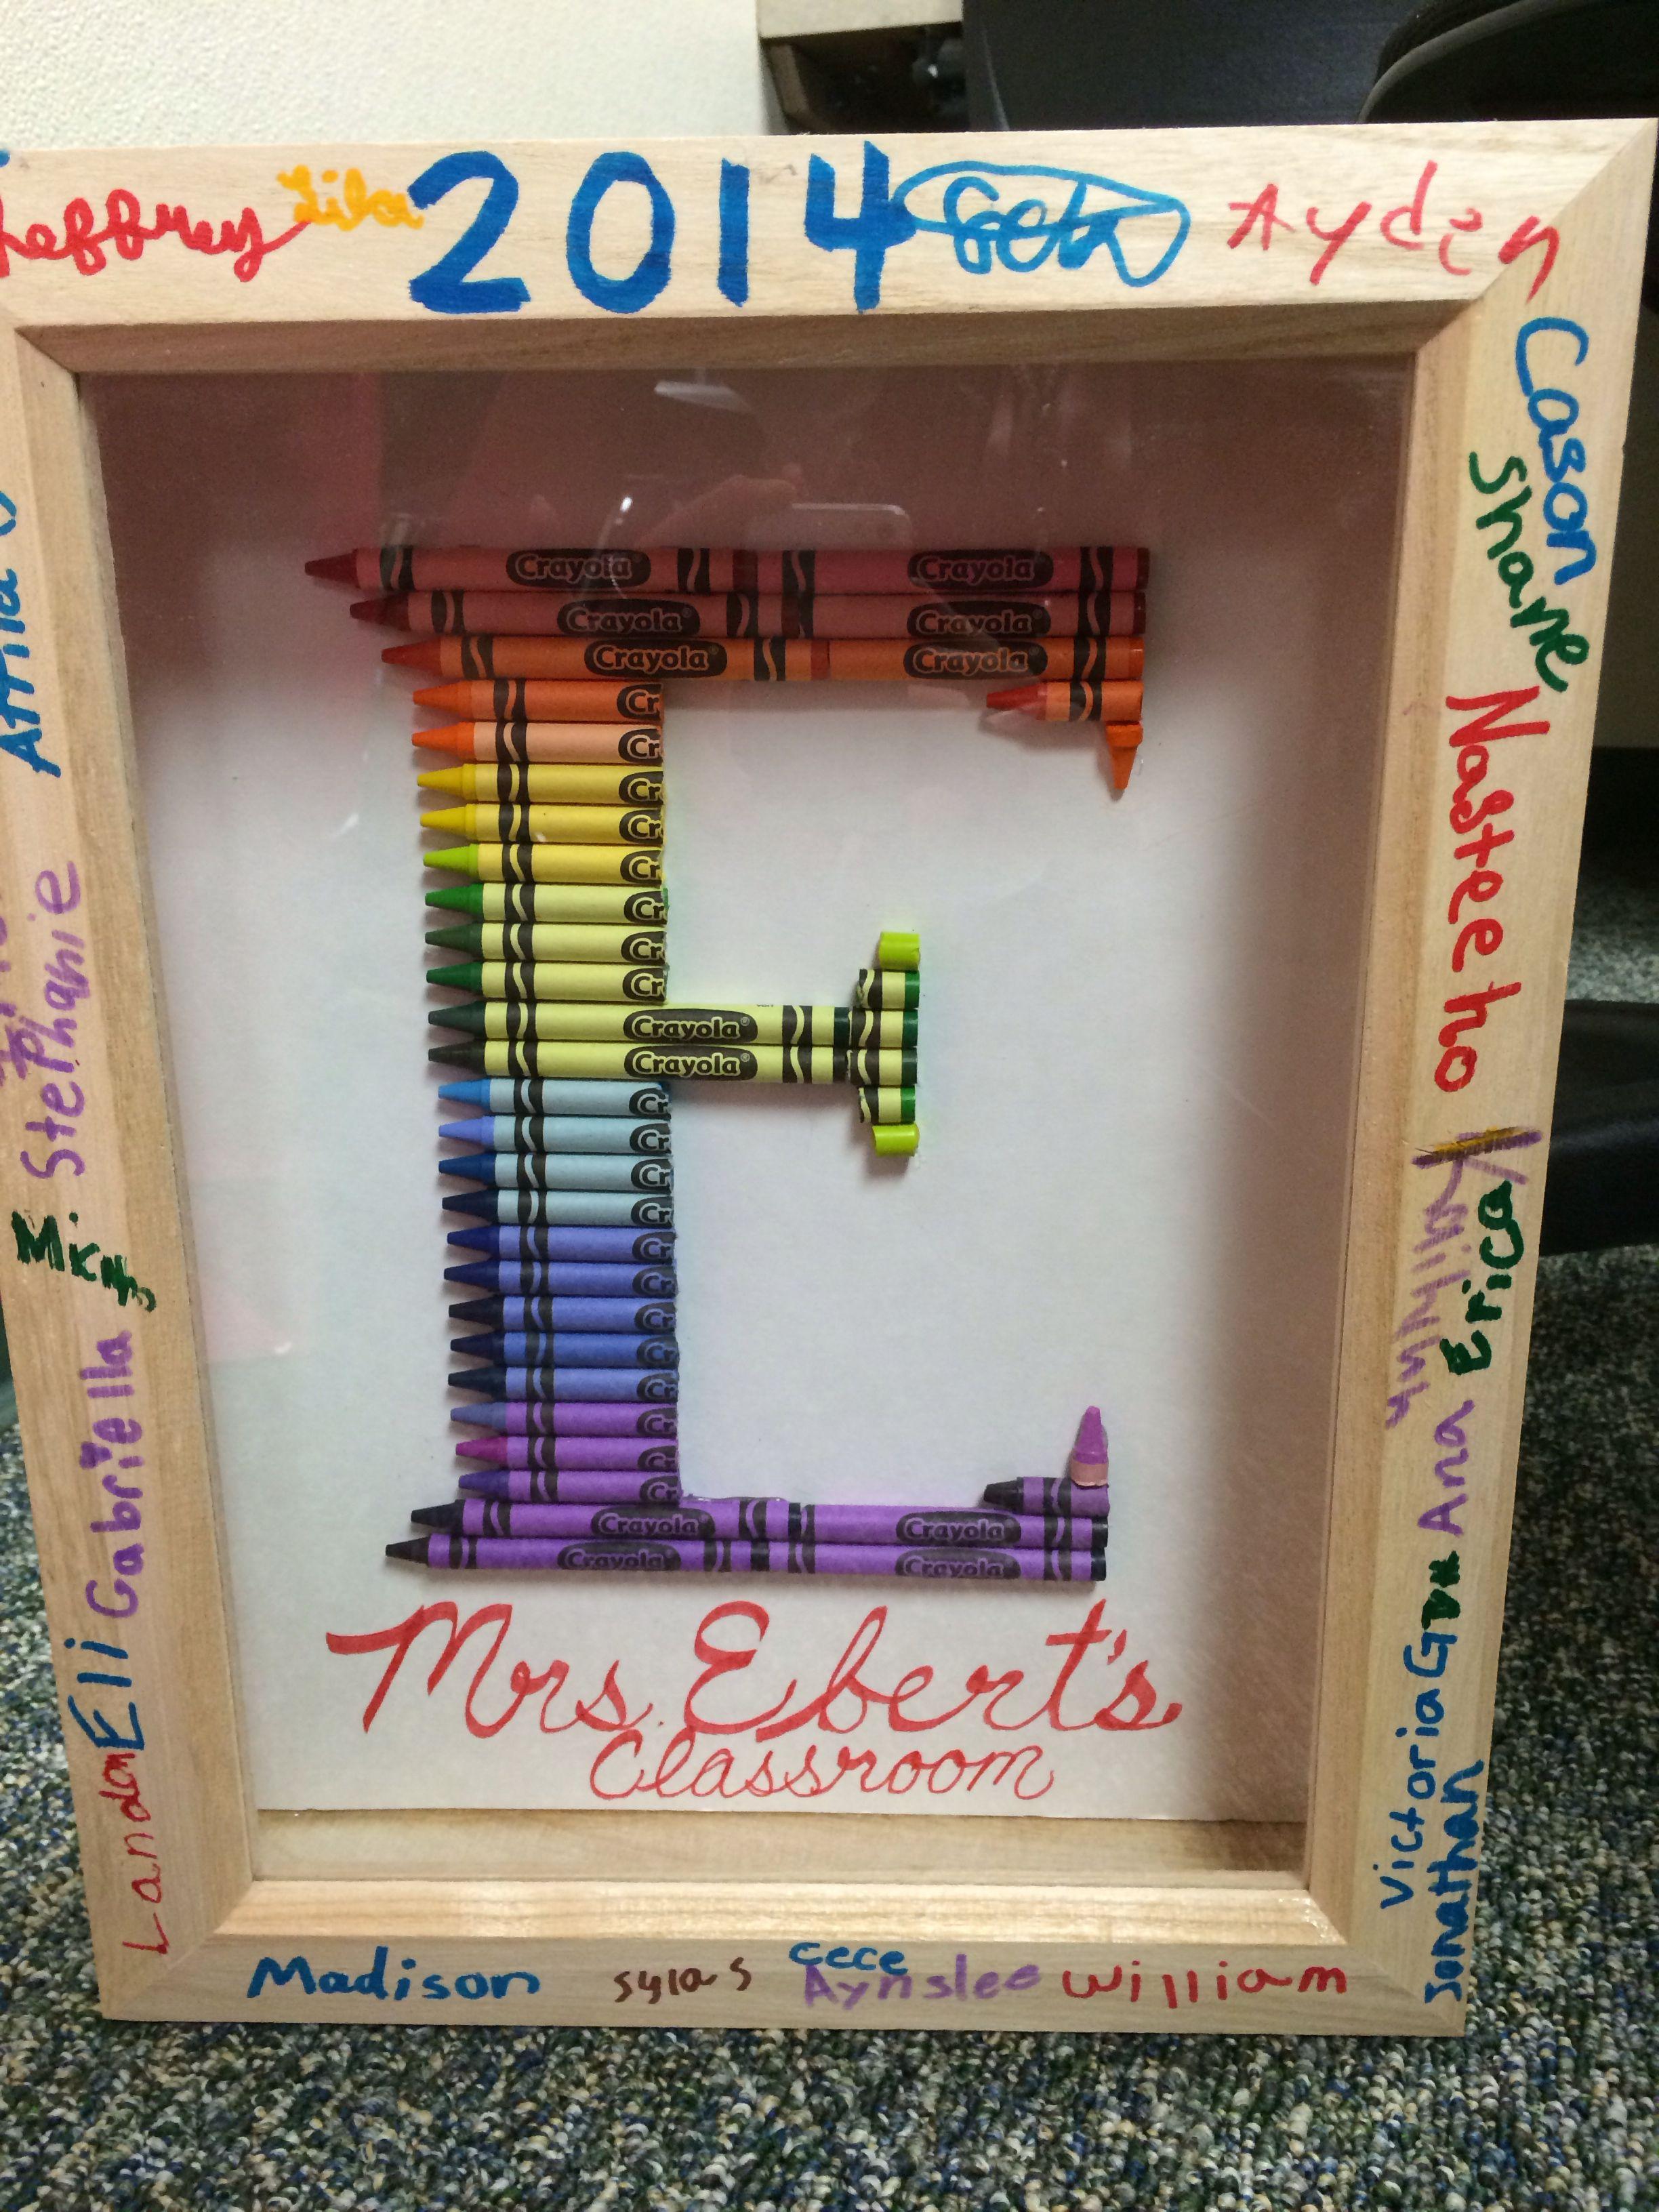 b83d729613fd0bb9d0a51490602cab5f Crayon Letter E Template on crayon colors template, crayon friendship template, crayon art template, crayon writing template, crayon yellow template,